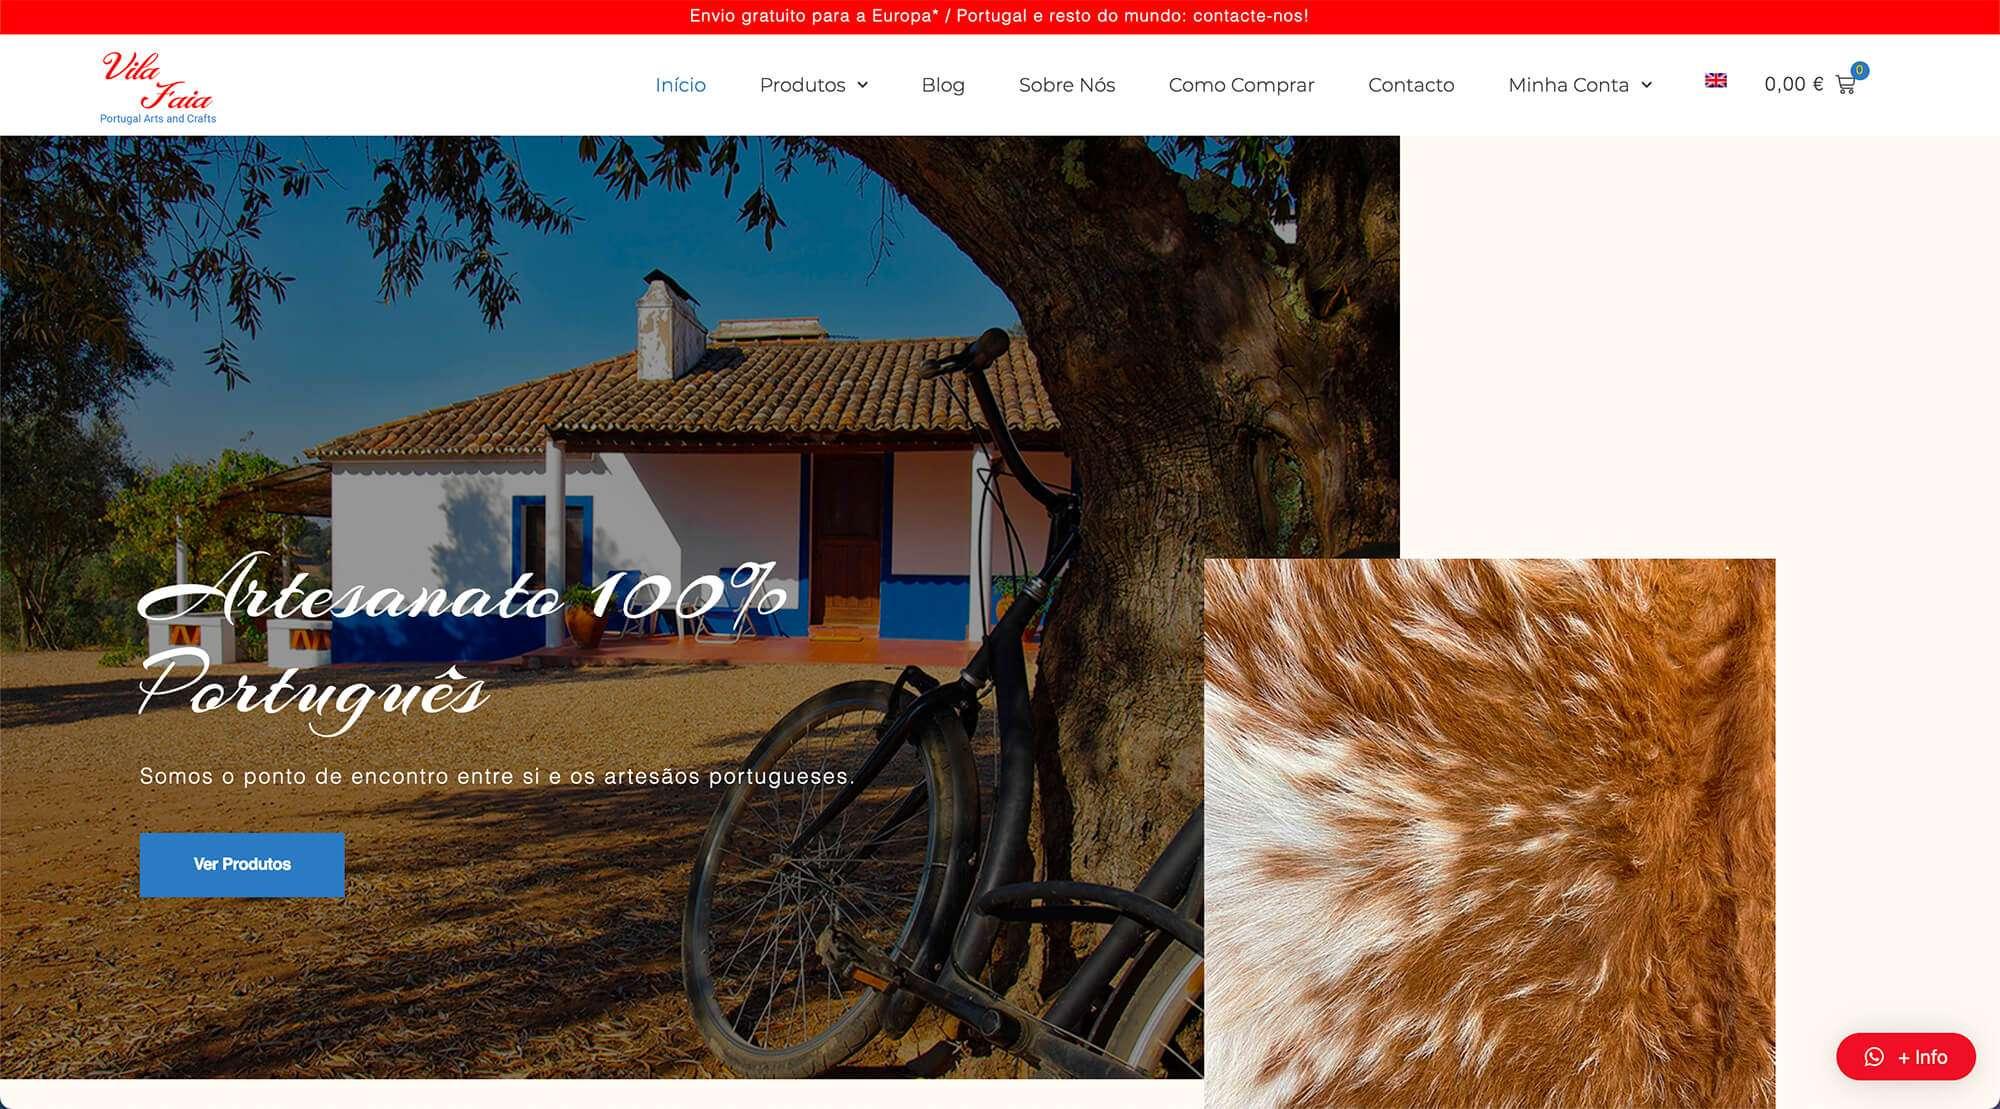 vila-faia-portugal-online-lab-web-development-web-design-1